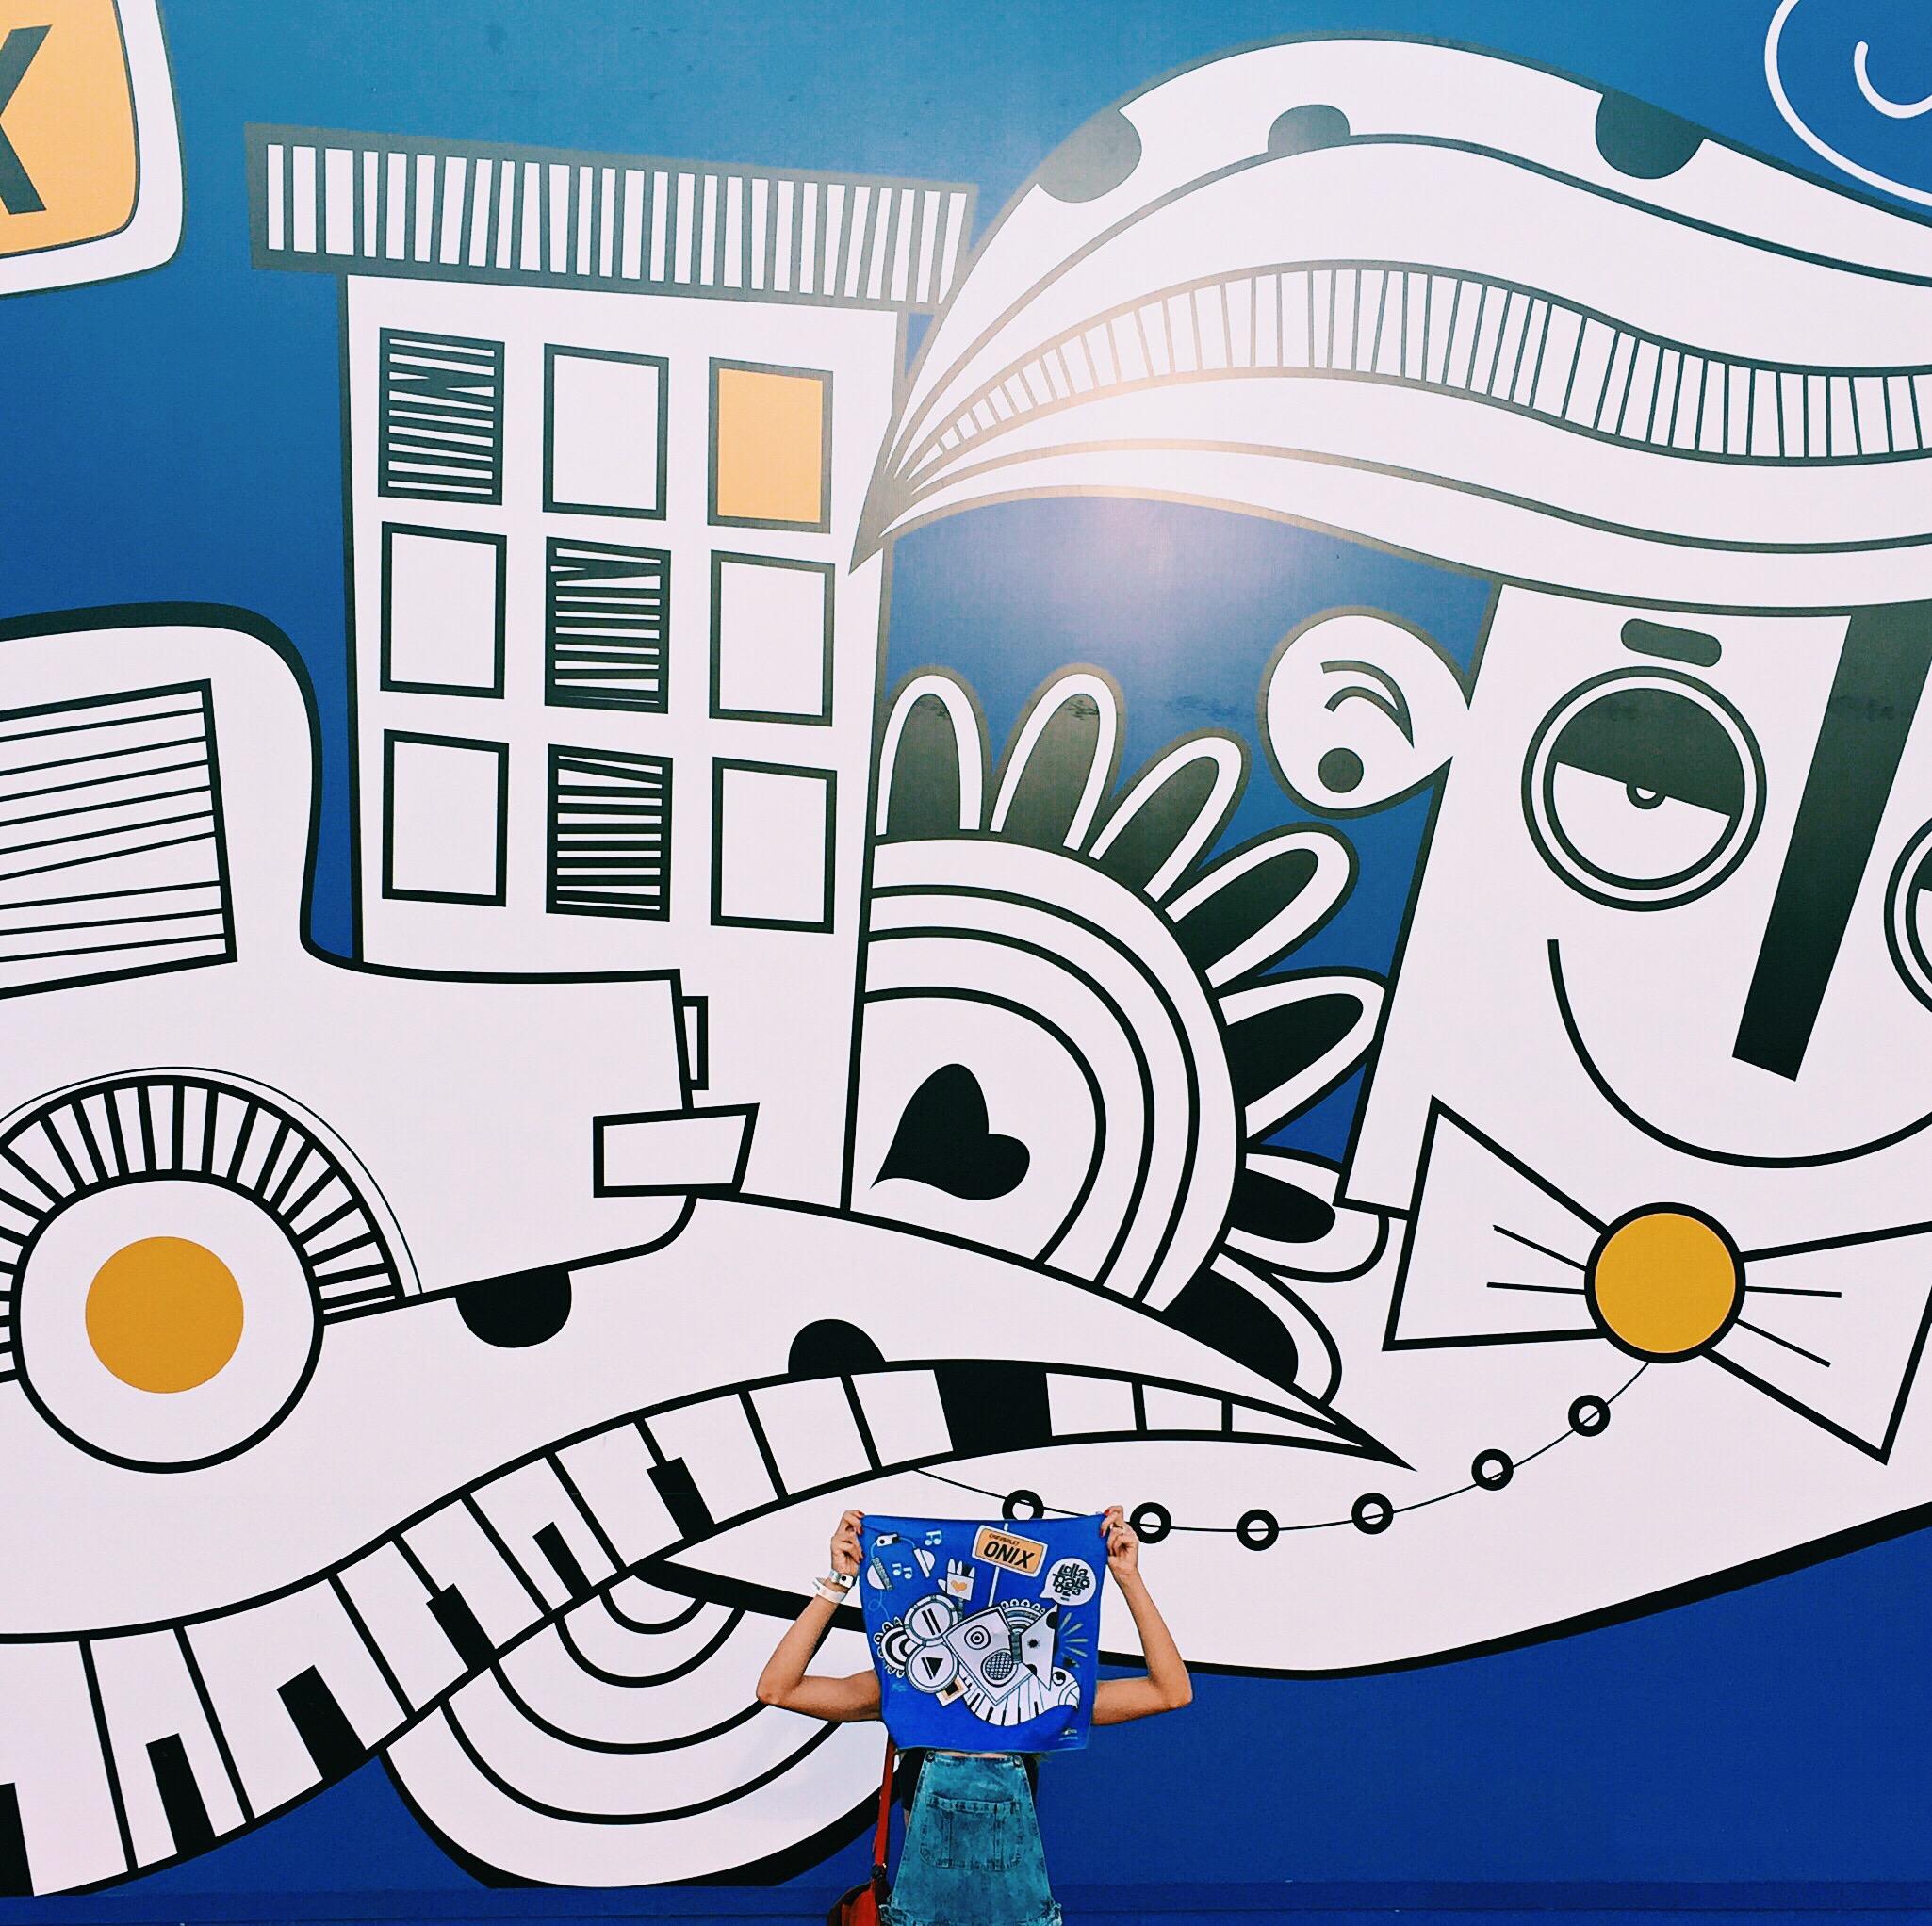 Chevrolet-Lollapalooza_DannyZappa_01.jpg